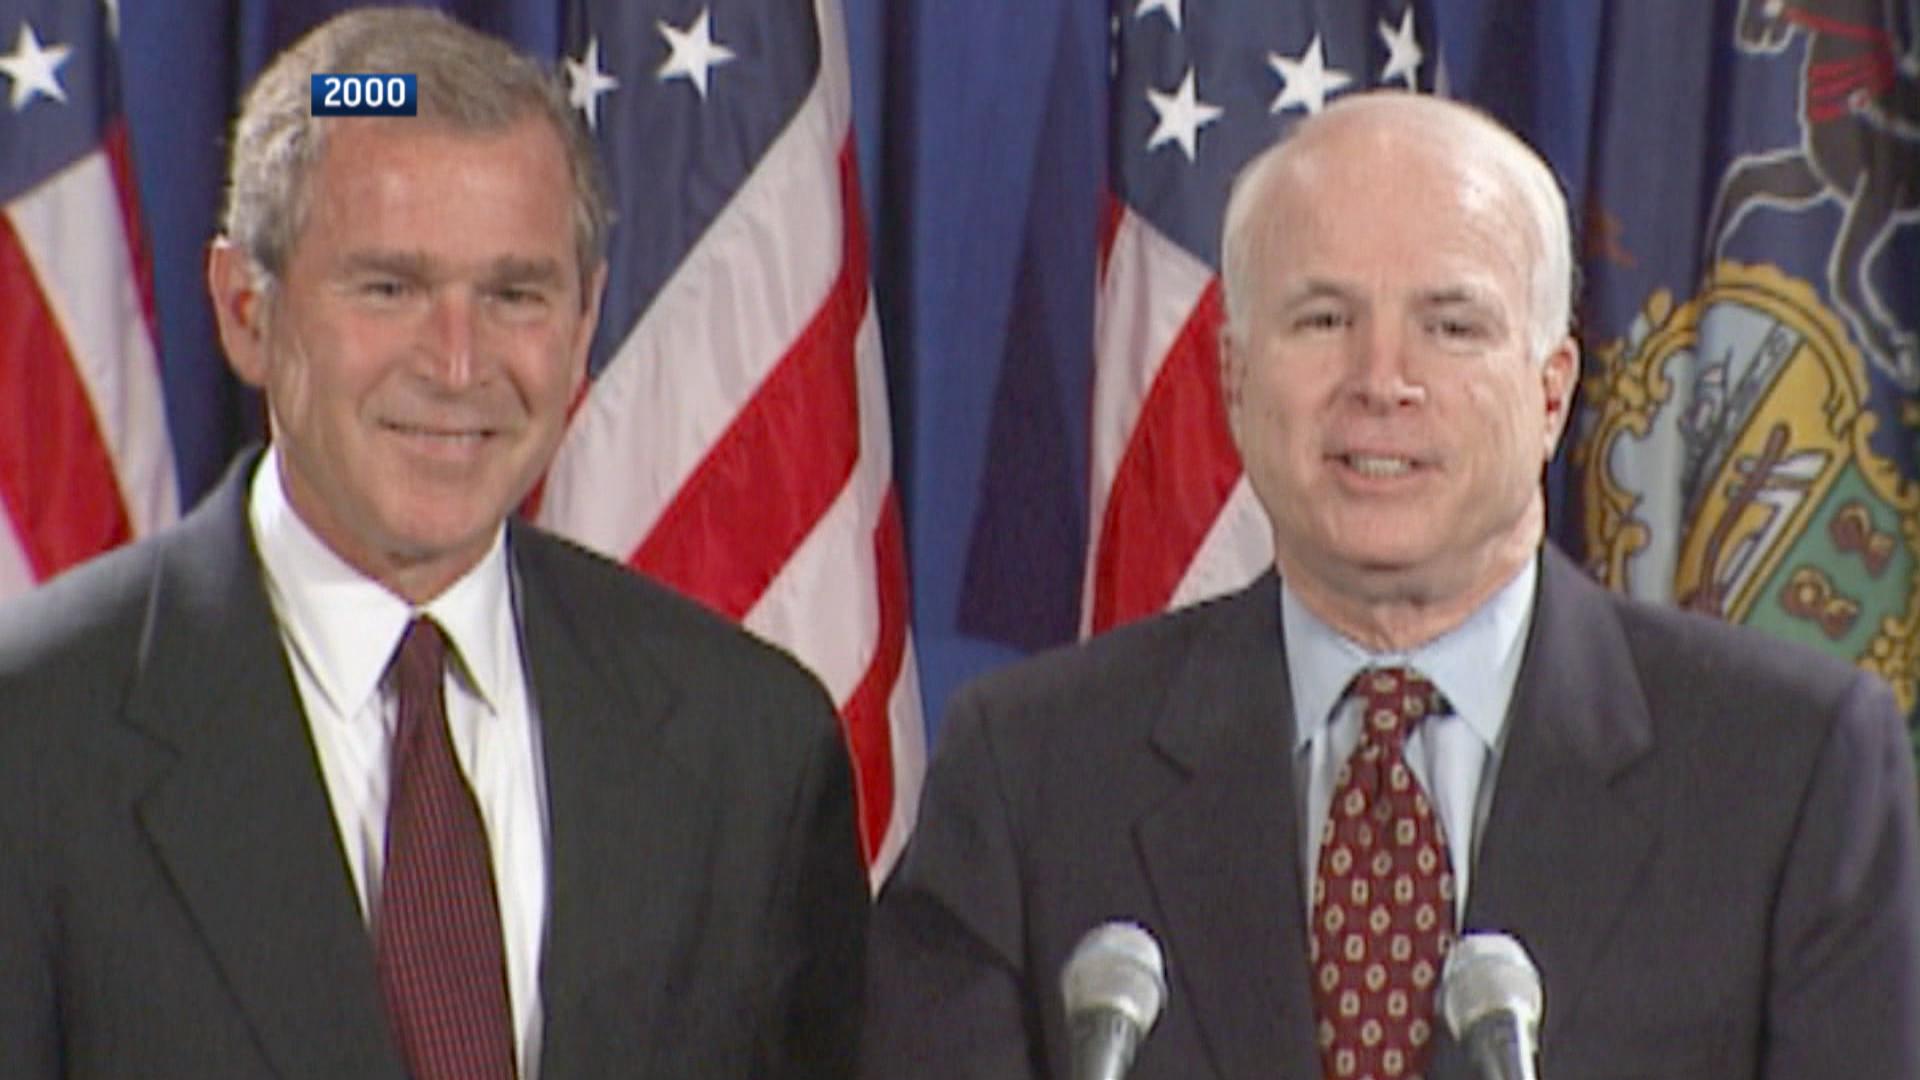 Sen. John McCain, the Arizona liberal?